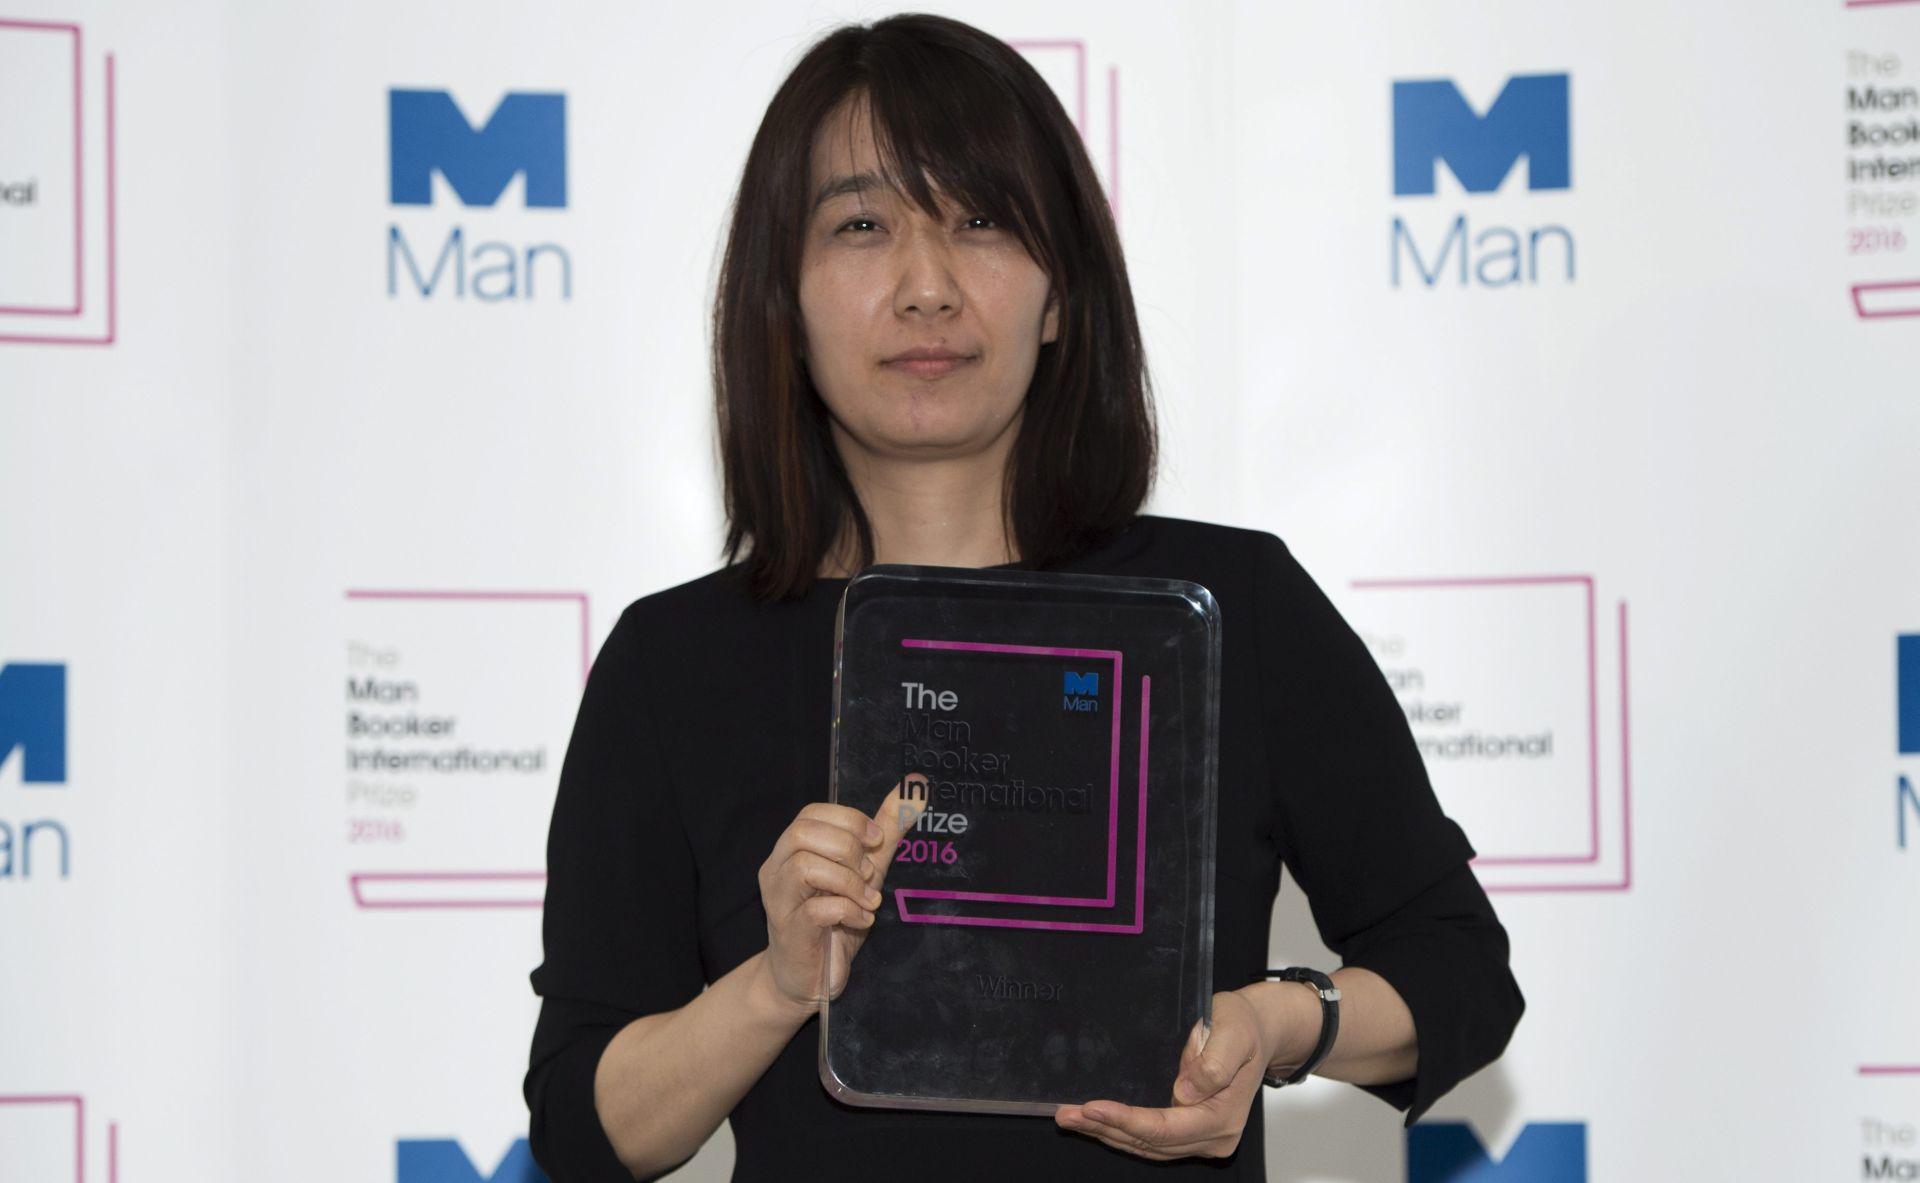 Južnokorejka Han Kang dobitnica Bookerove nagrade